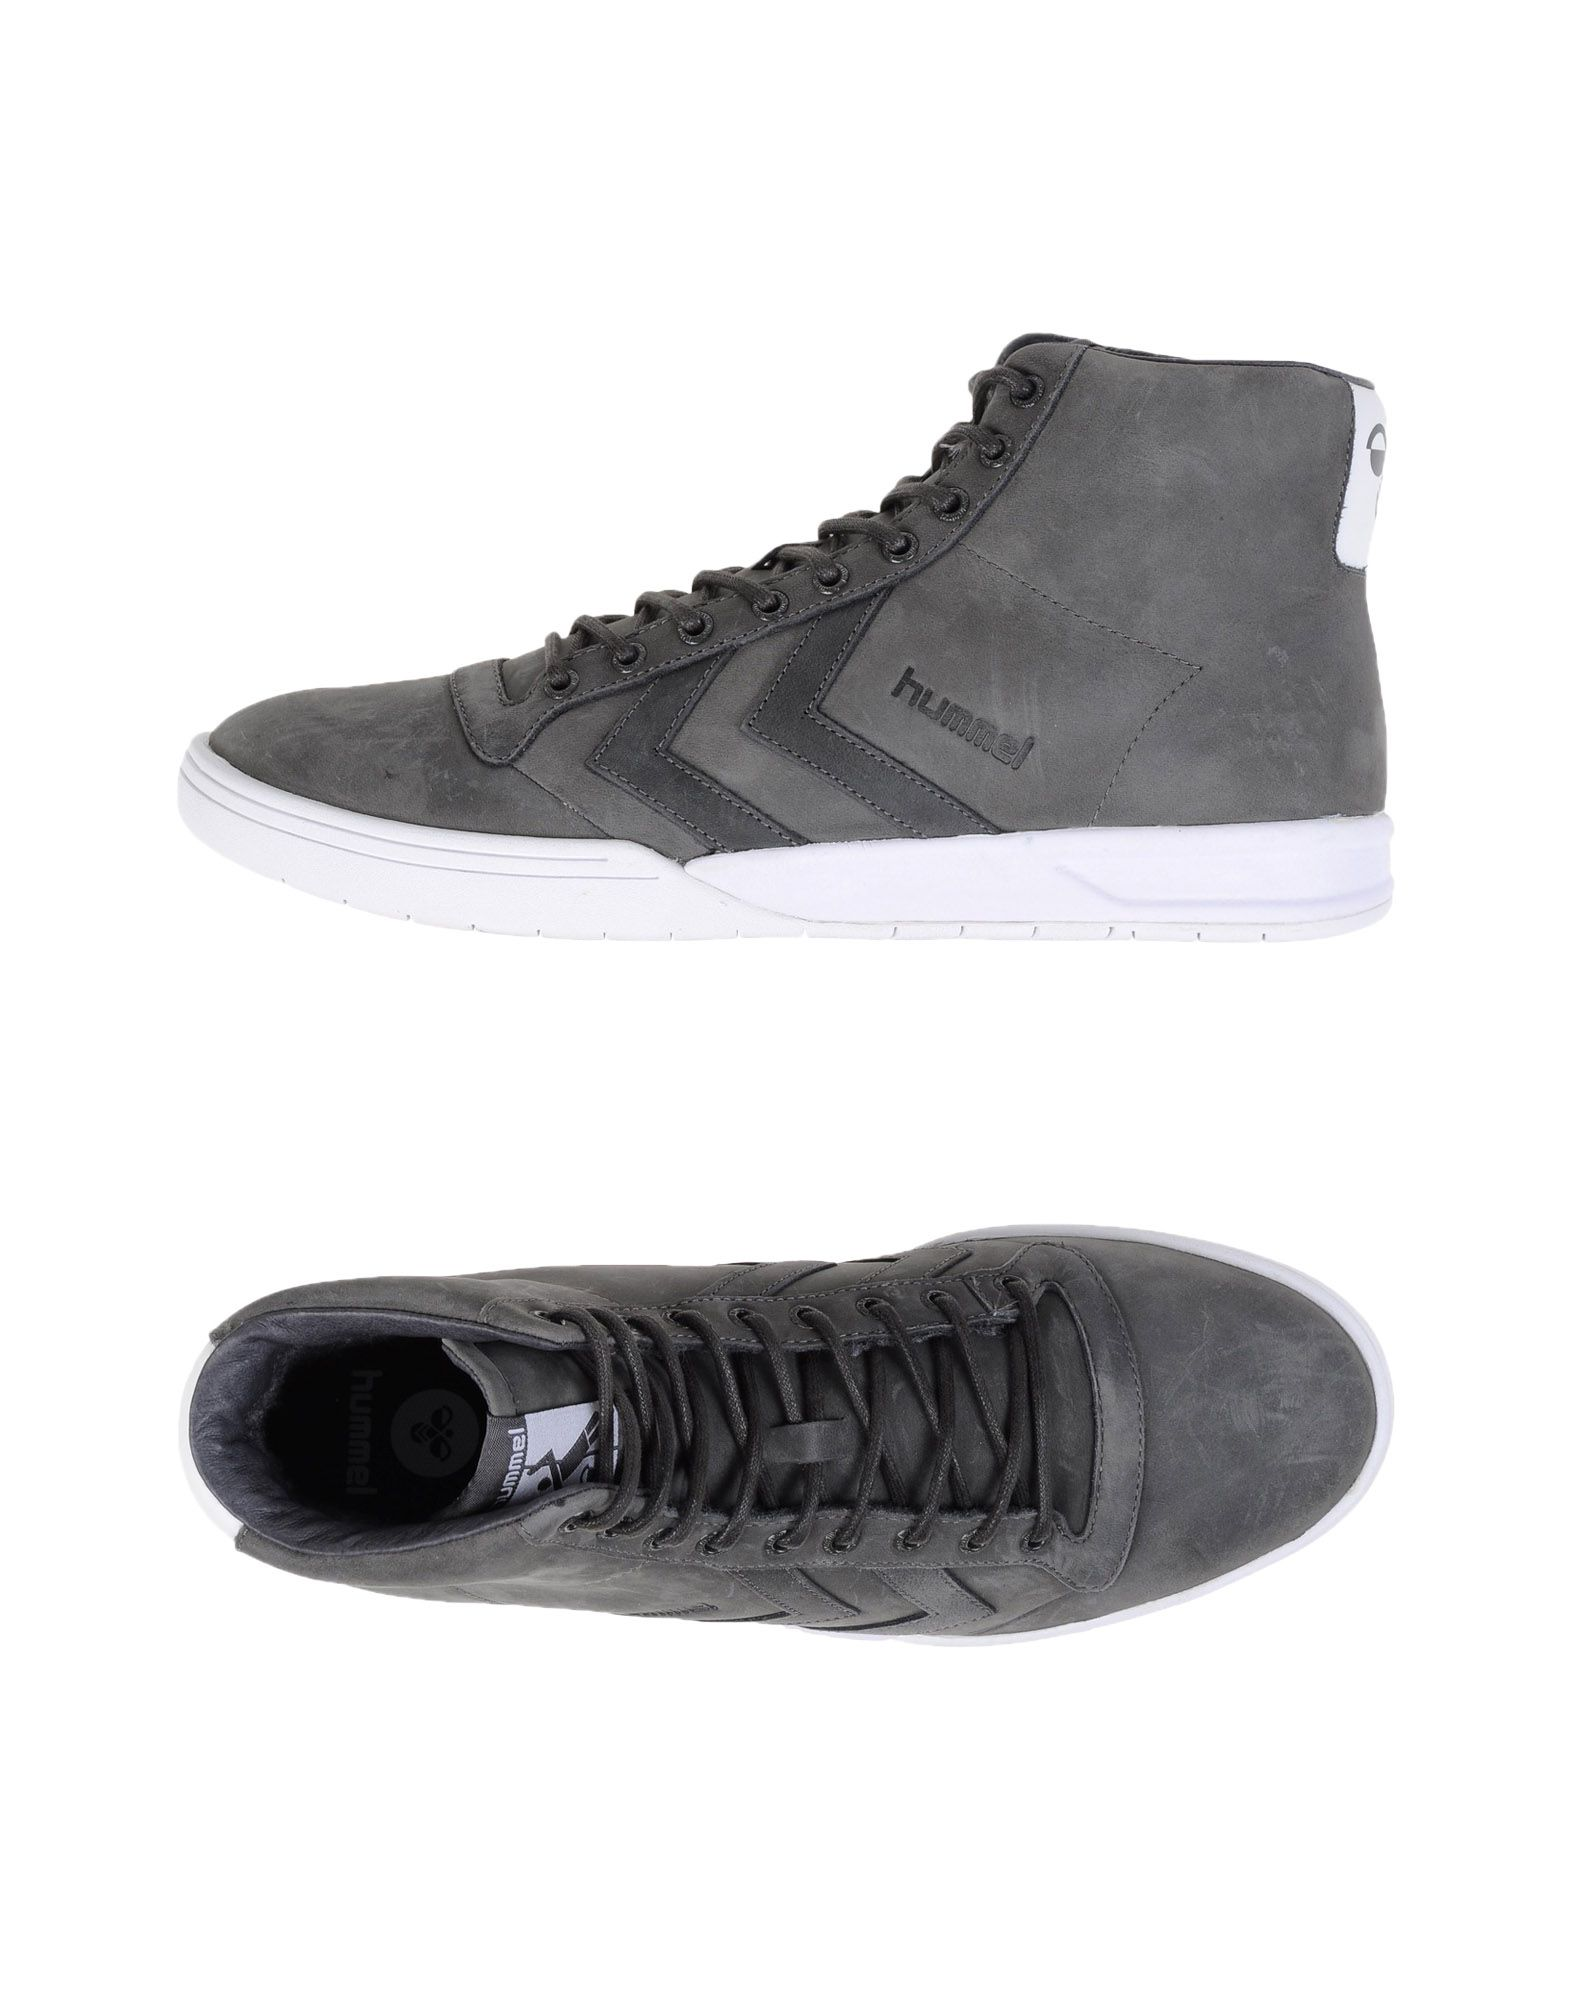 Scarpe da Ginnastica Hummel Sneaker Hml Stadil Winter High Sneaker Hummel - Uomo - 11110381KU 9b6a8e